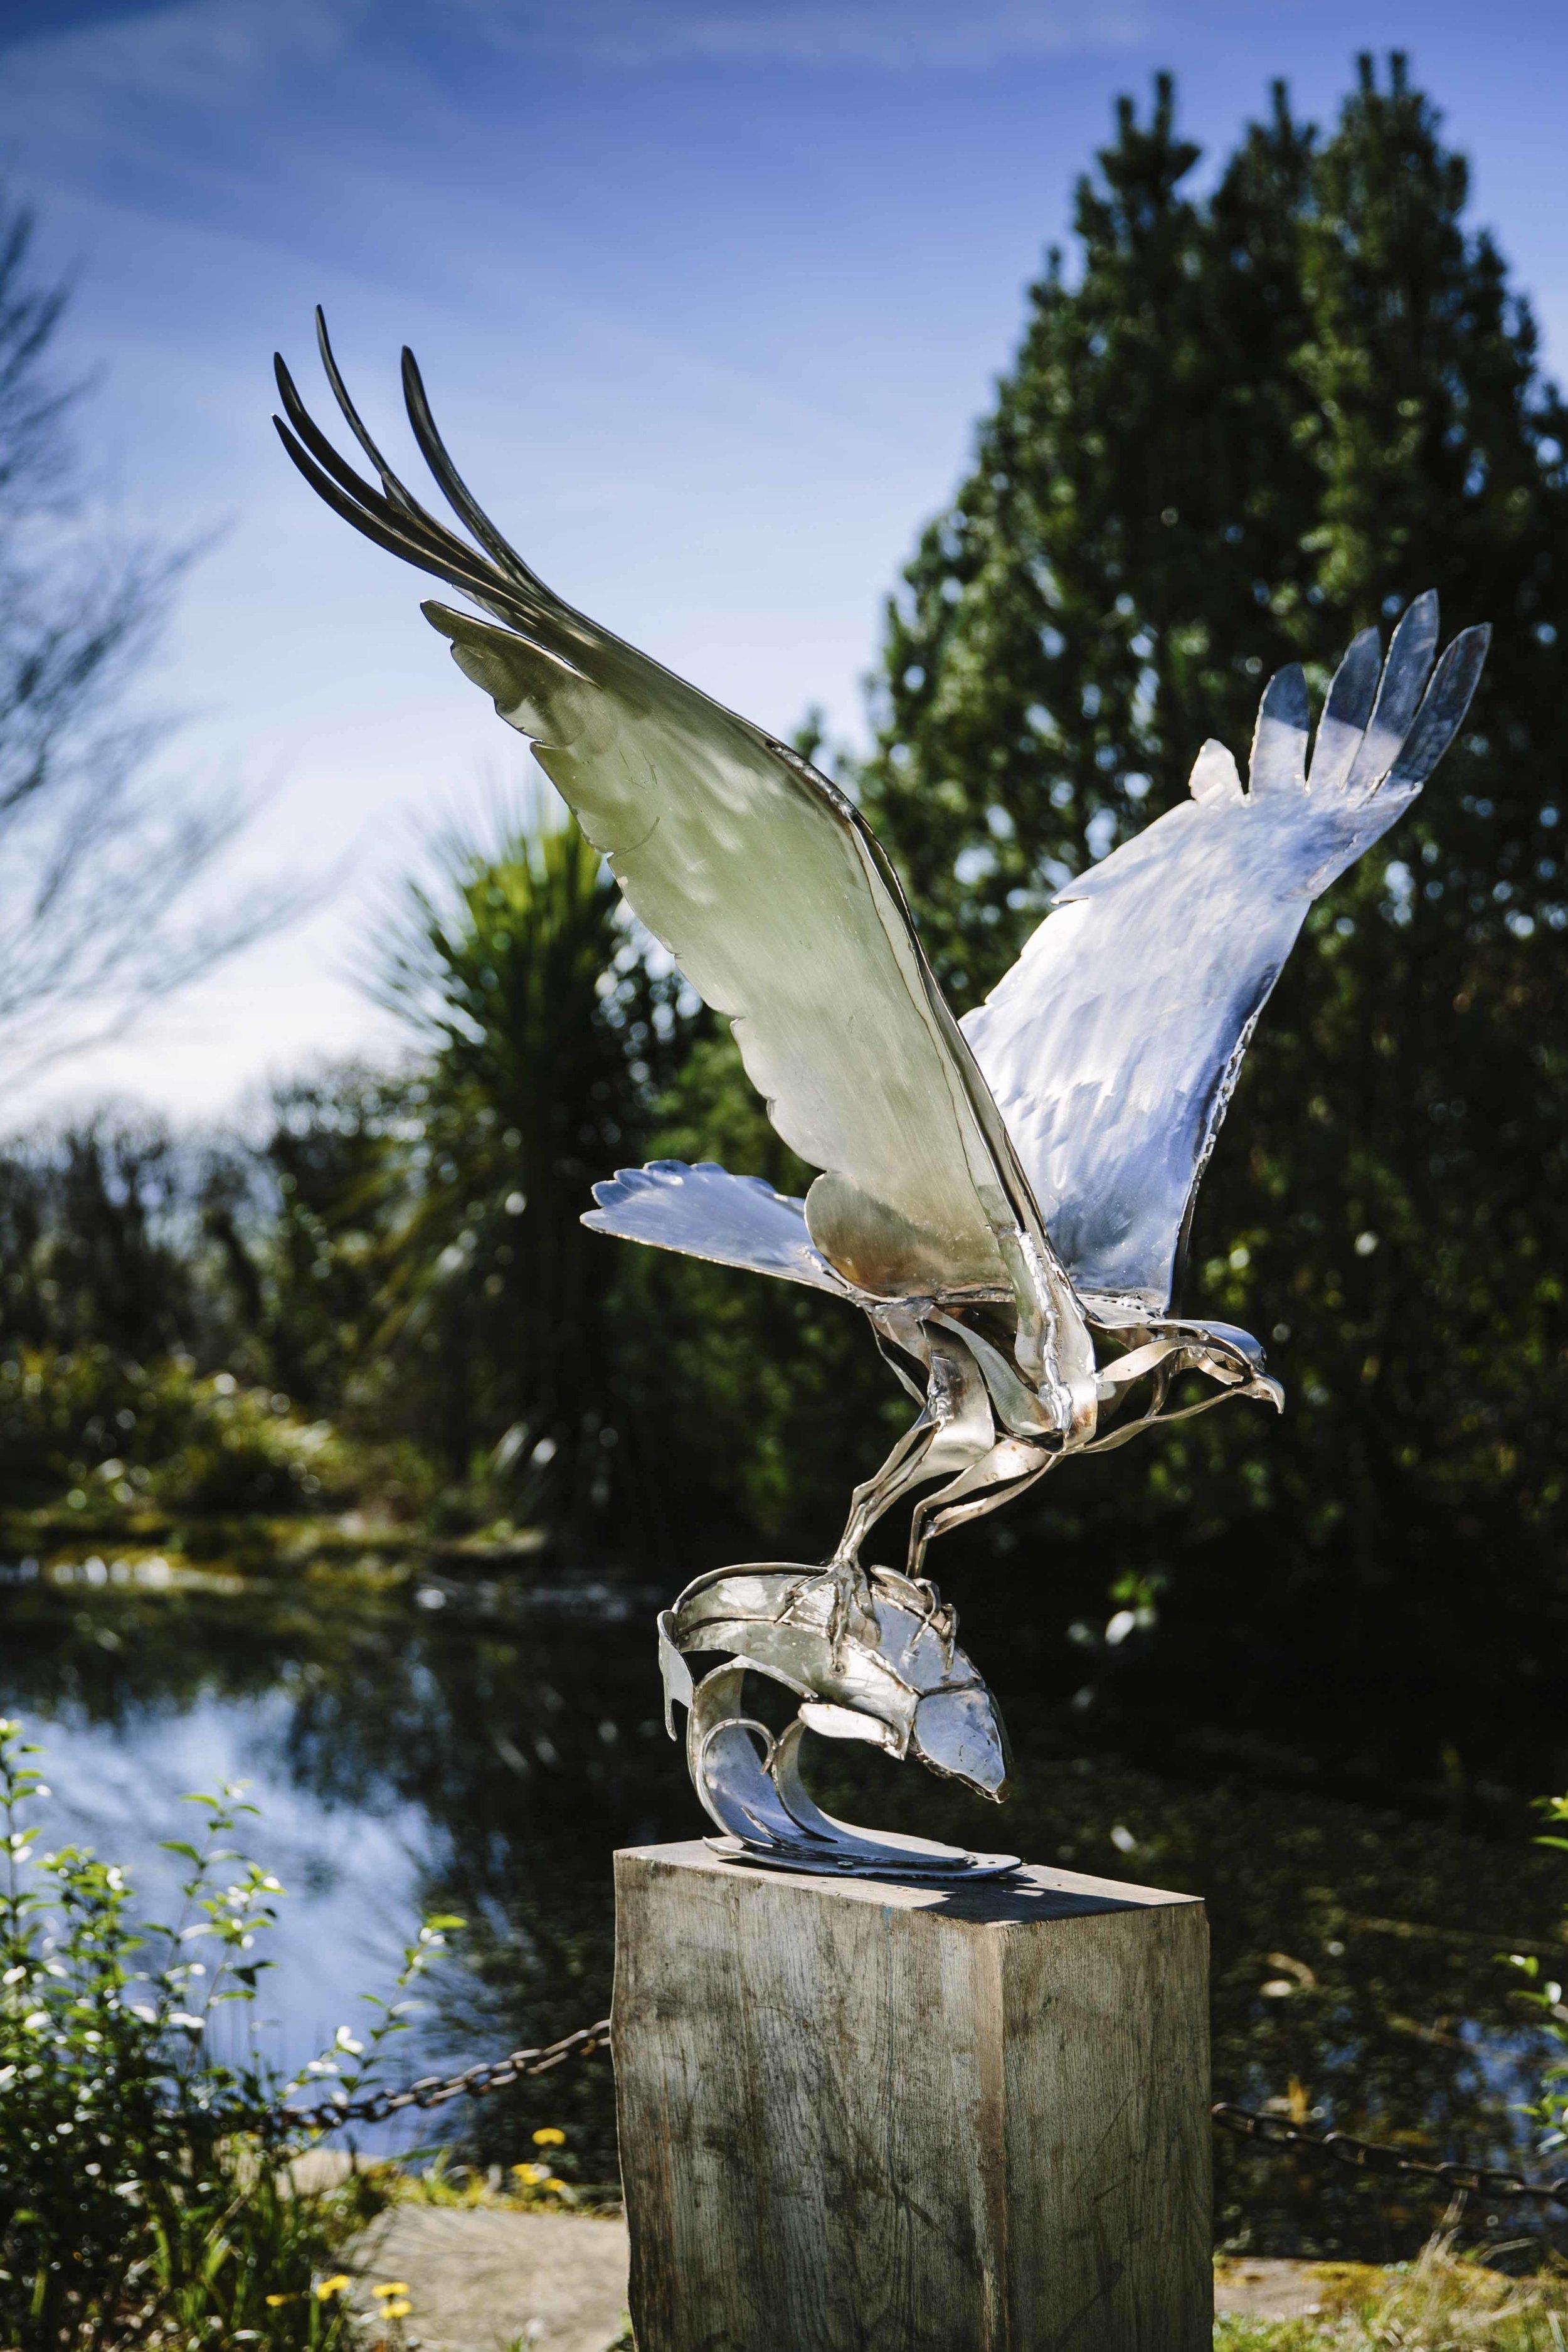 Clare_Bigger_Sculpture_Osprey01.jpg